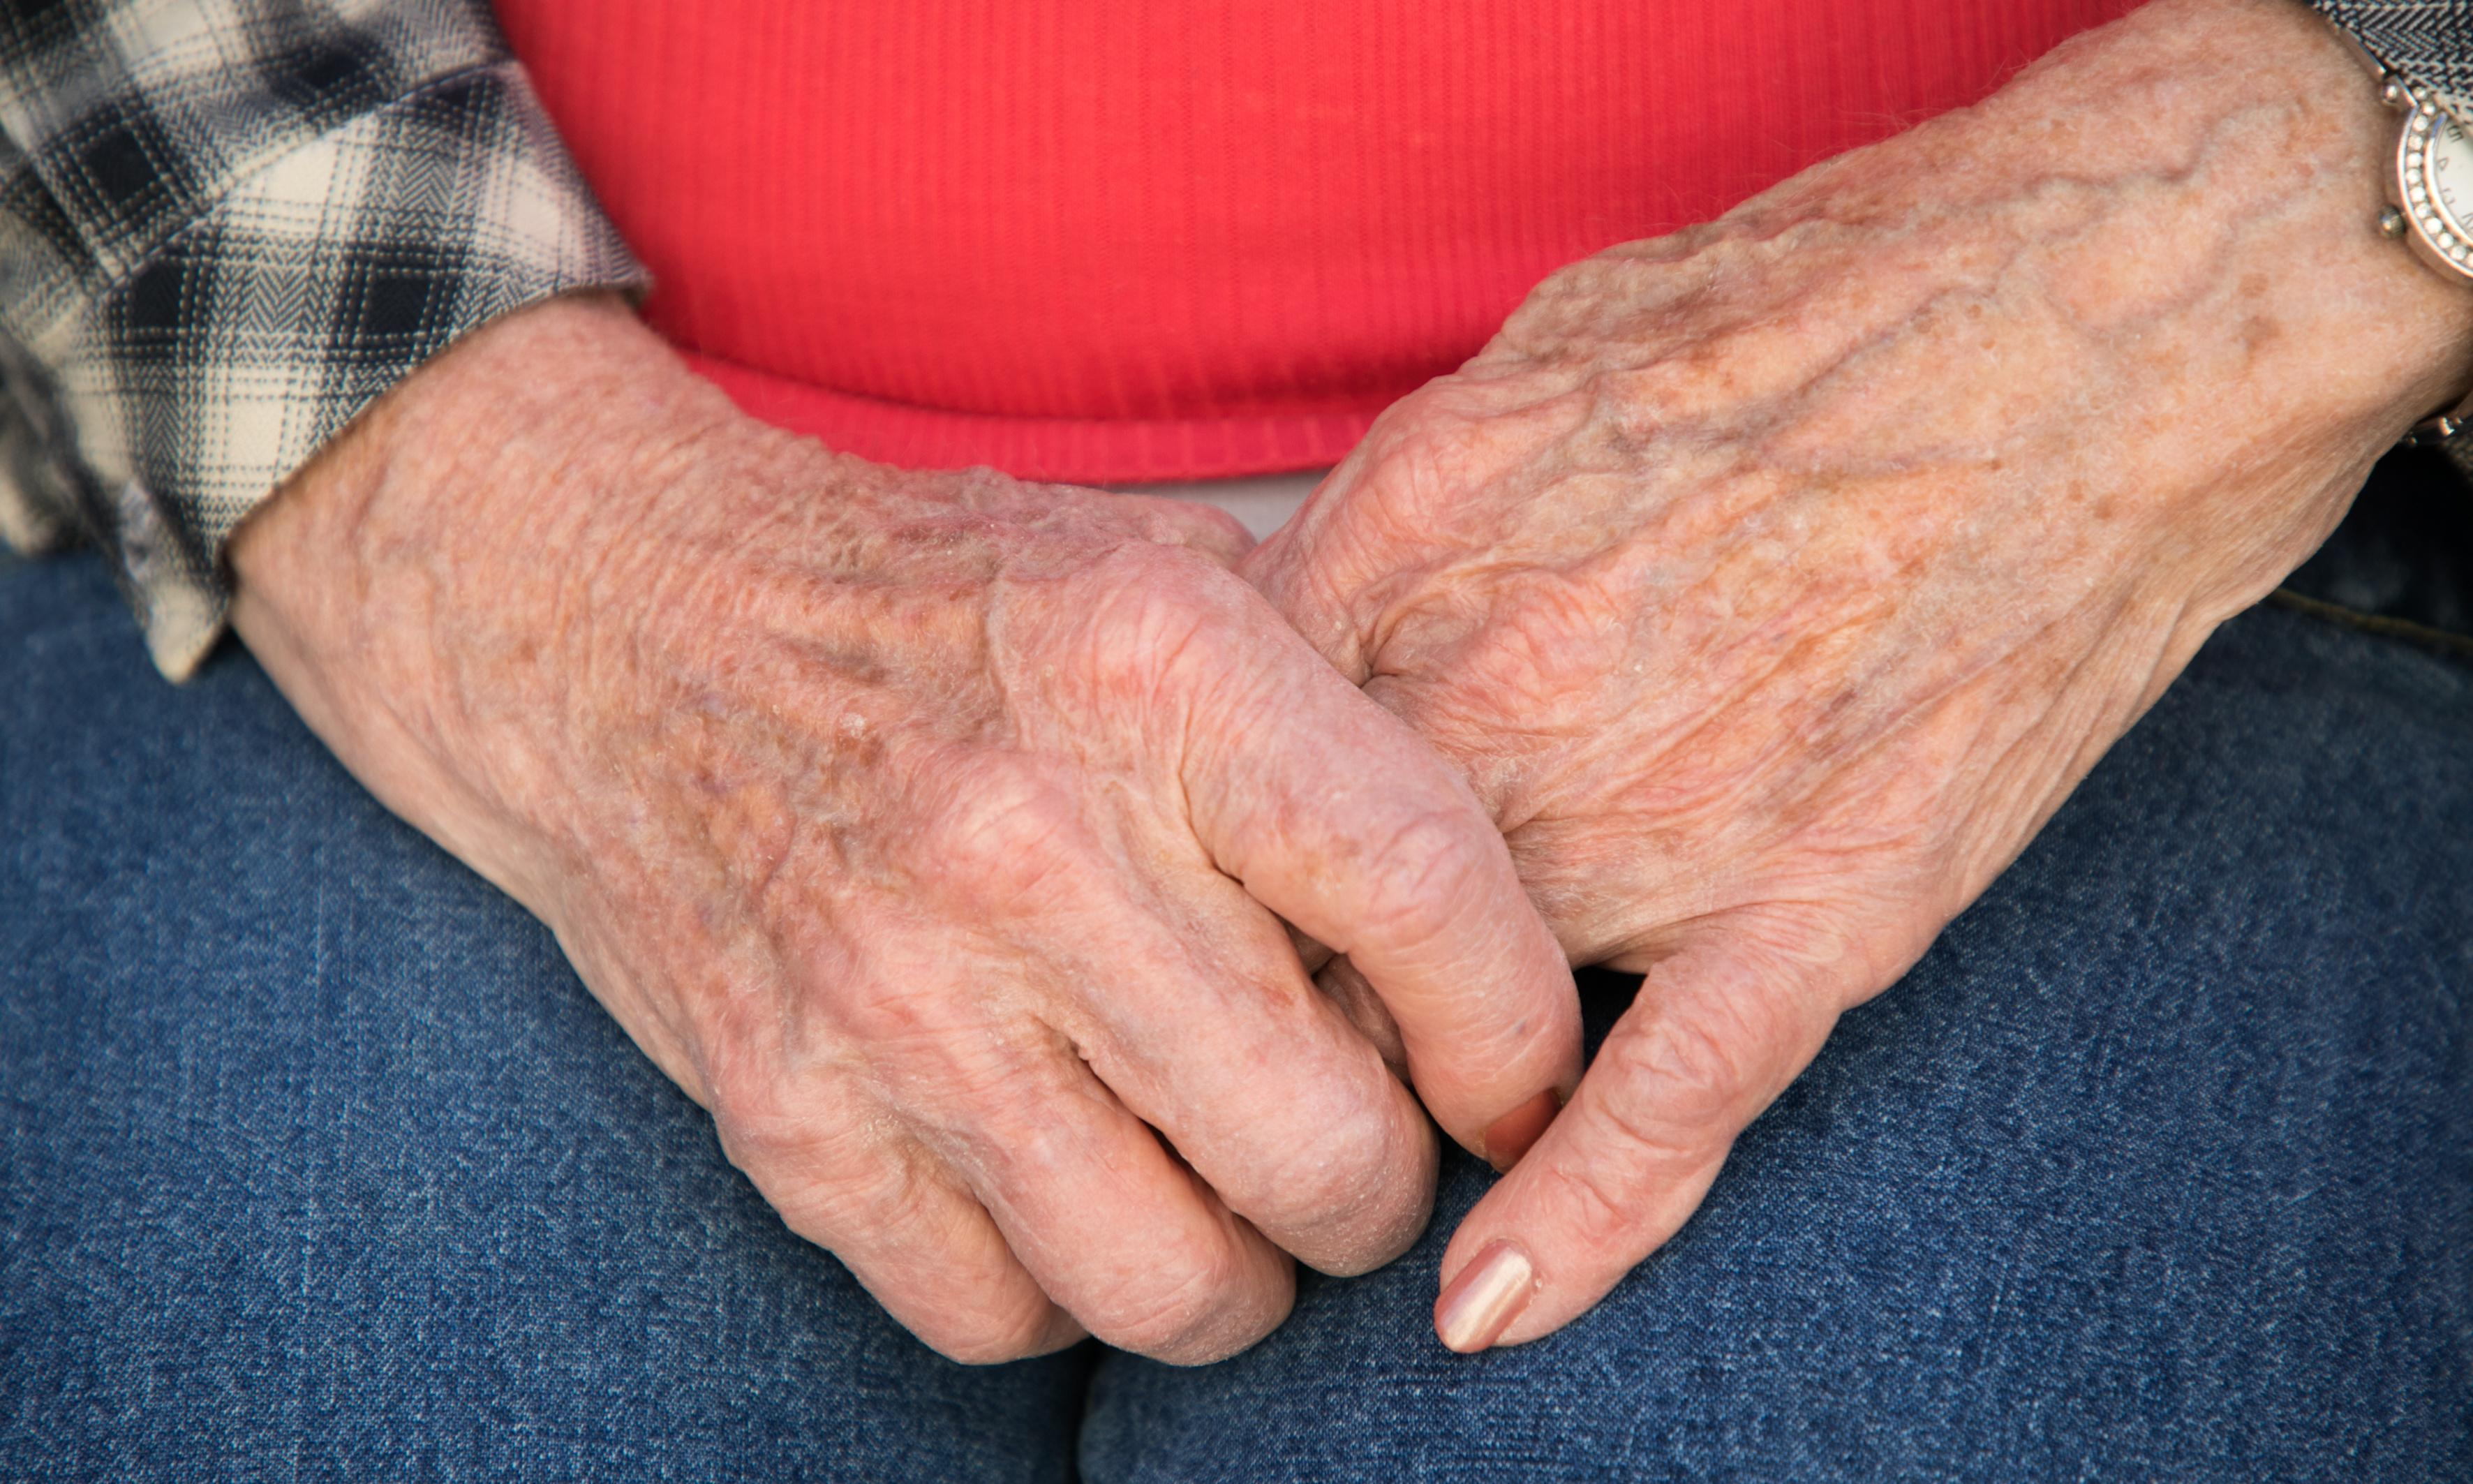 Senior Australians face longer wait times to get into aged care